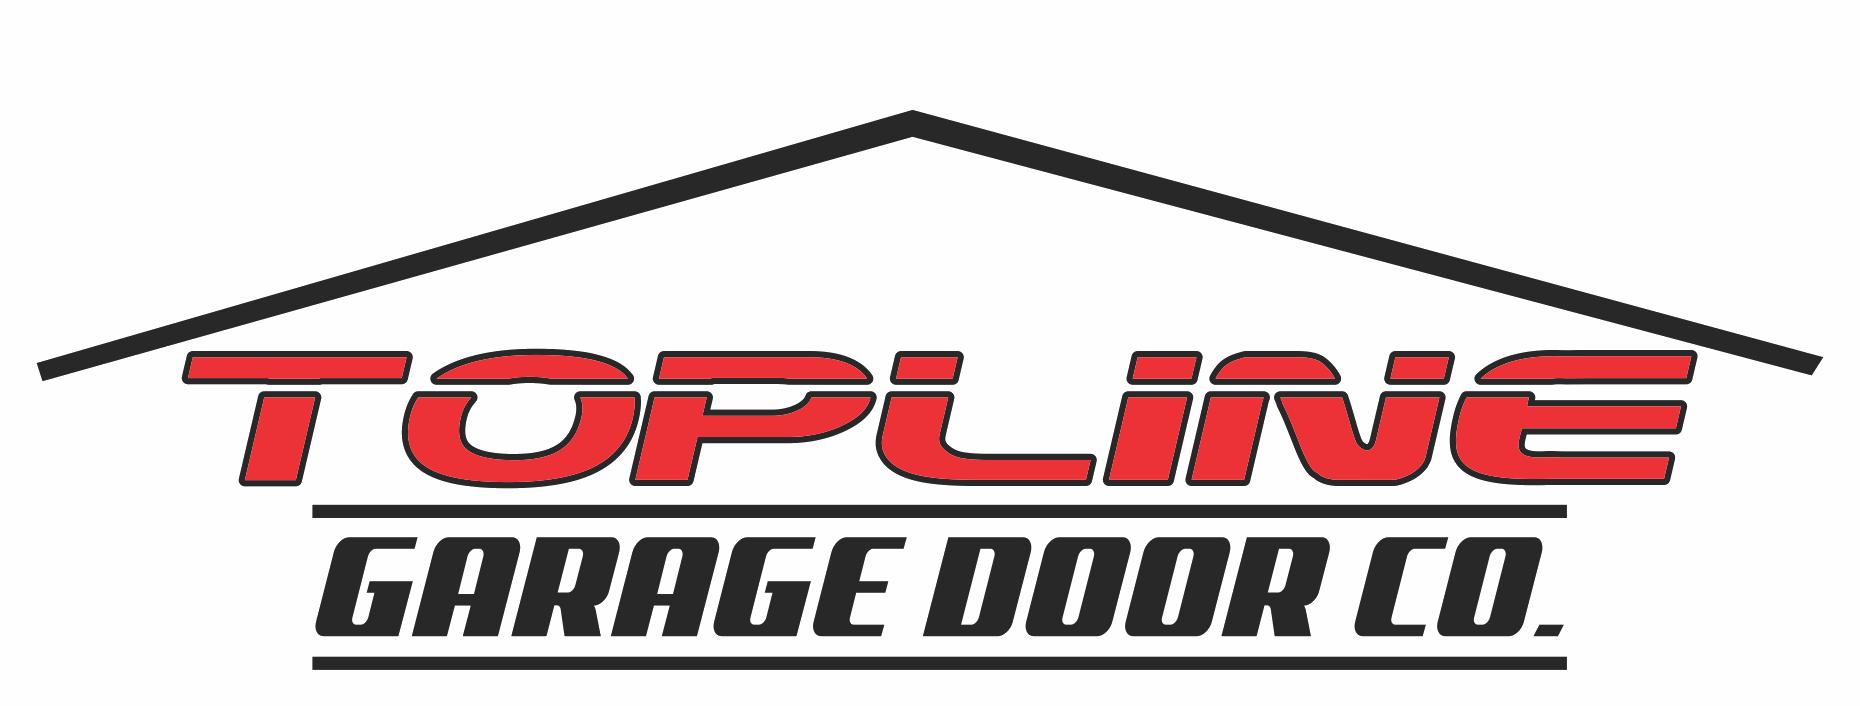 Garage door service logo - Site Navigation